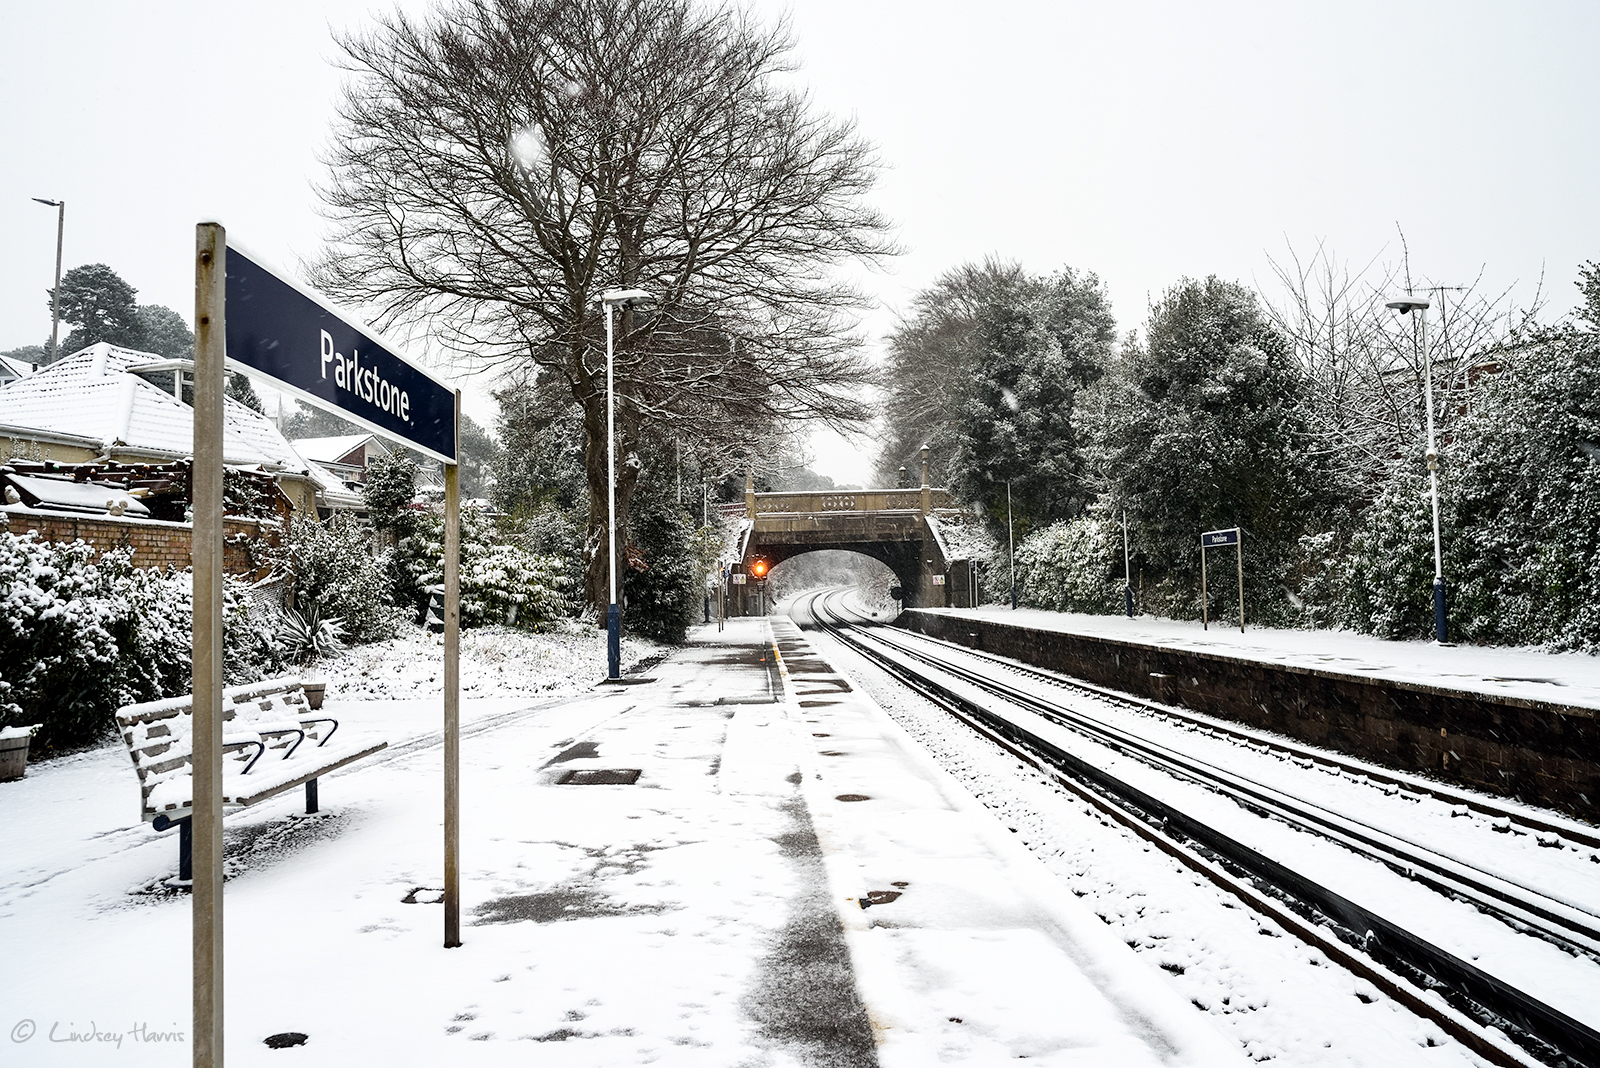 Snow at Parkstone Station, Lower Parkstone, Poole, Dorset.